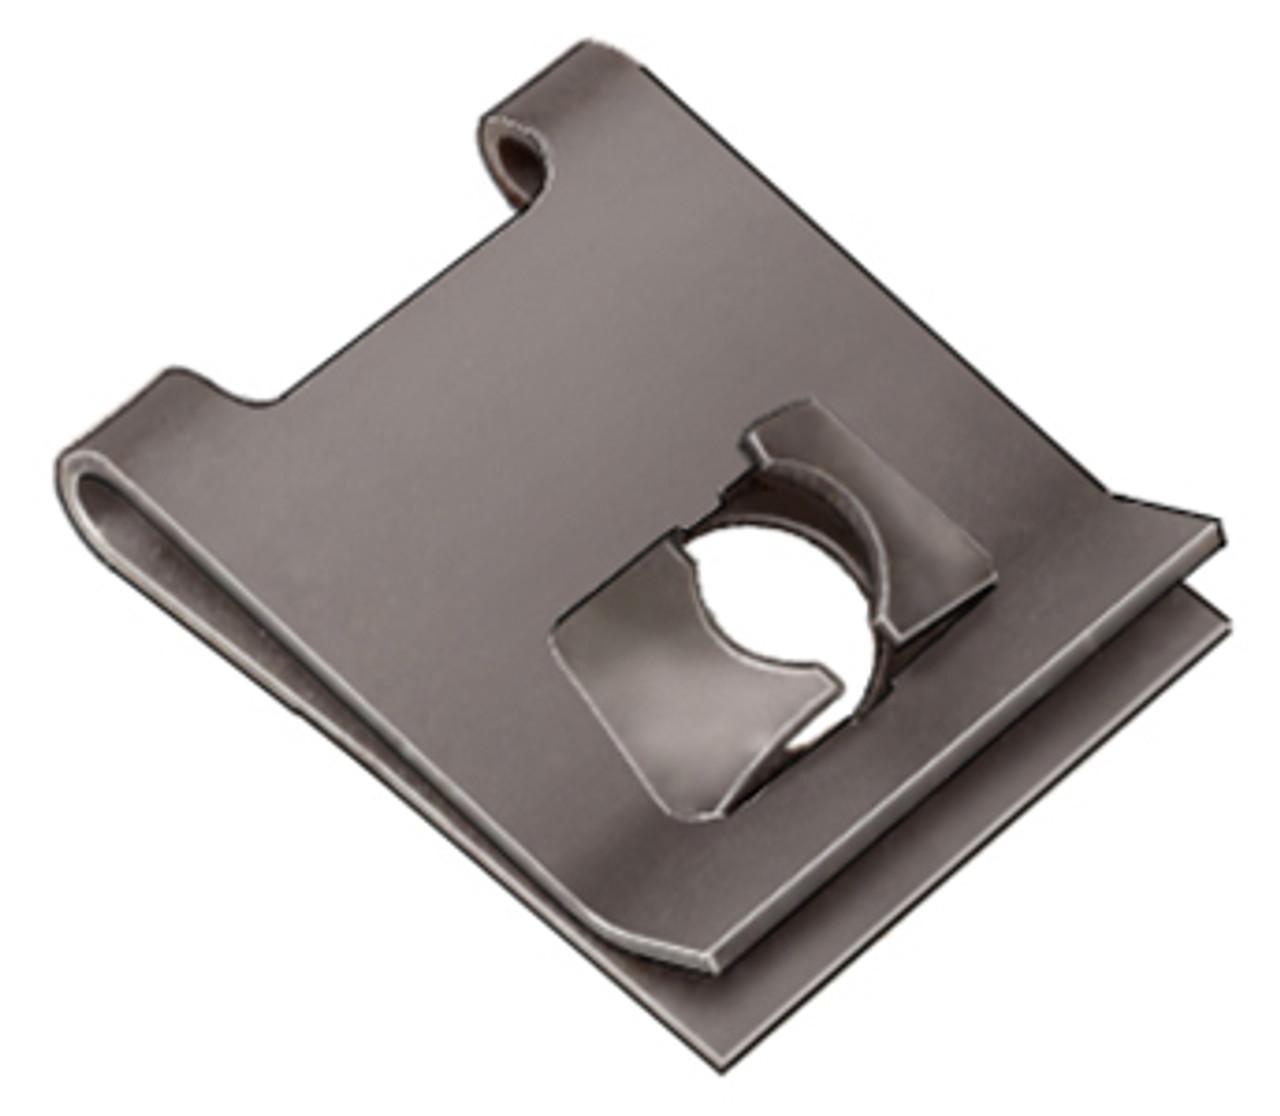 "Screw Size: #10 Panel Range: .020"" - .051"" Center Of Hole To Edge: 15/32"" 50 Per Box"